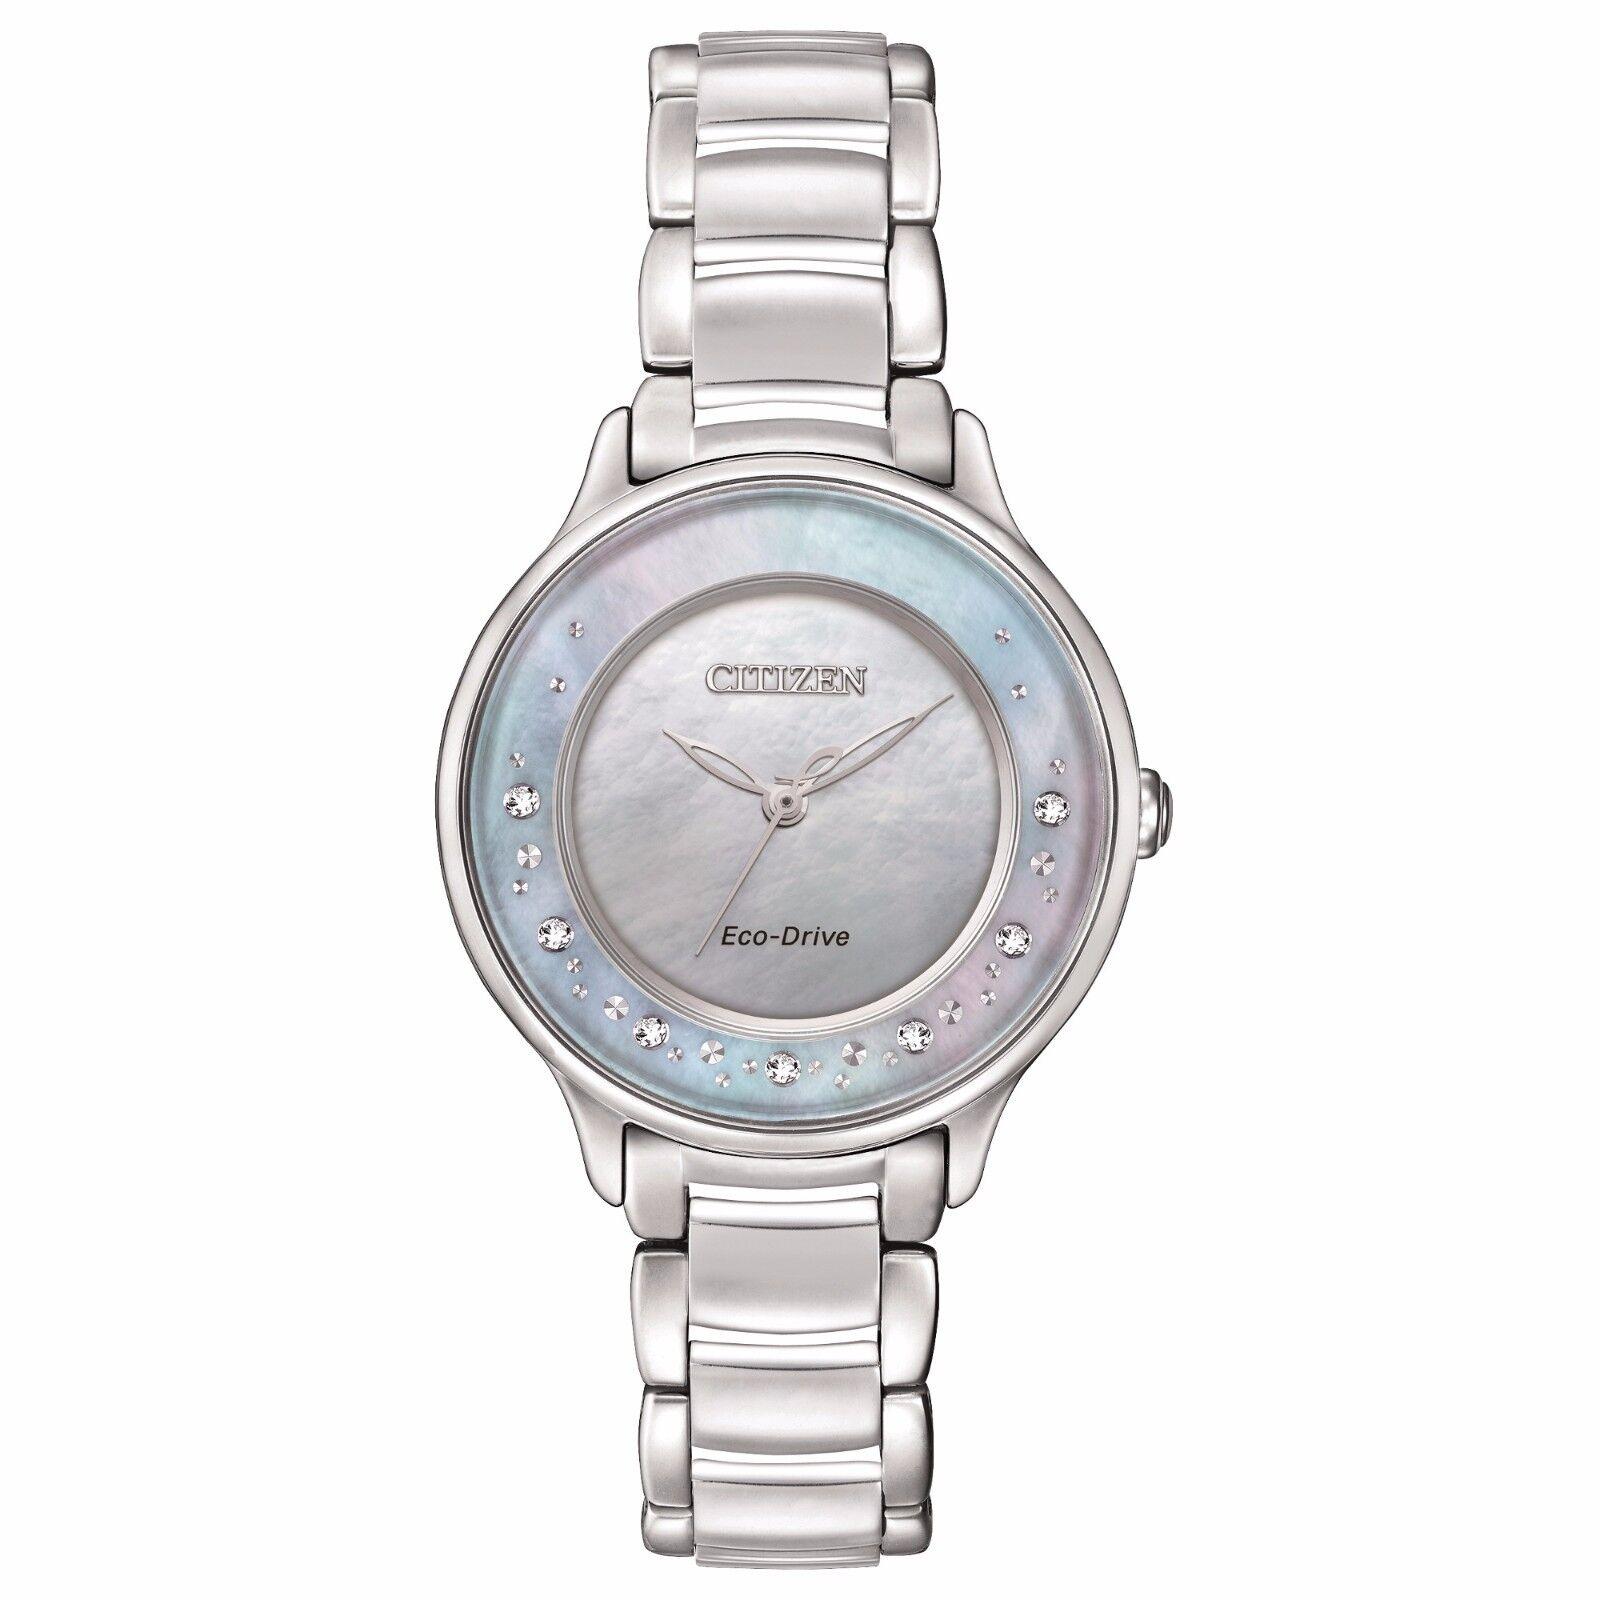 Citizen Eco-Drive Women's Silver-Tone Circle of Time Diamonds Watch EM0380-81N